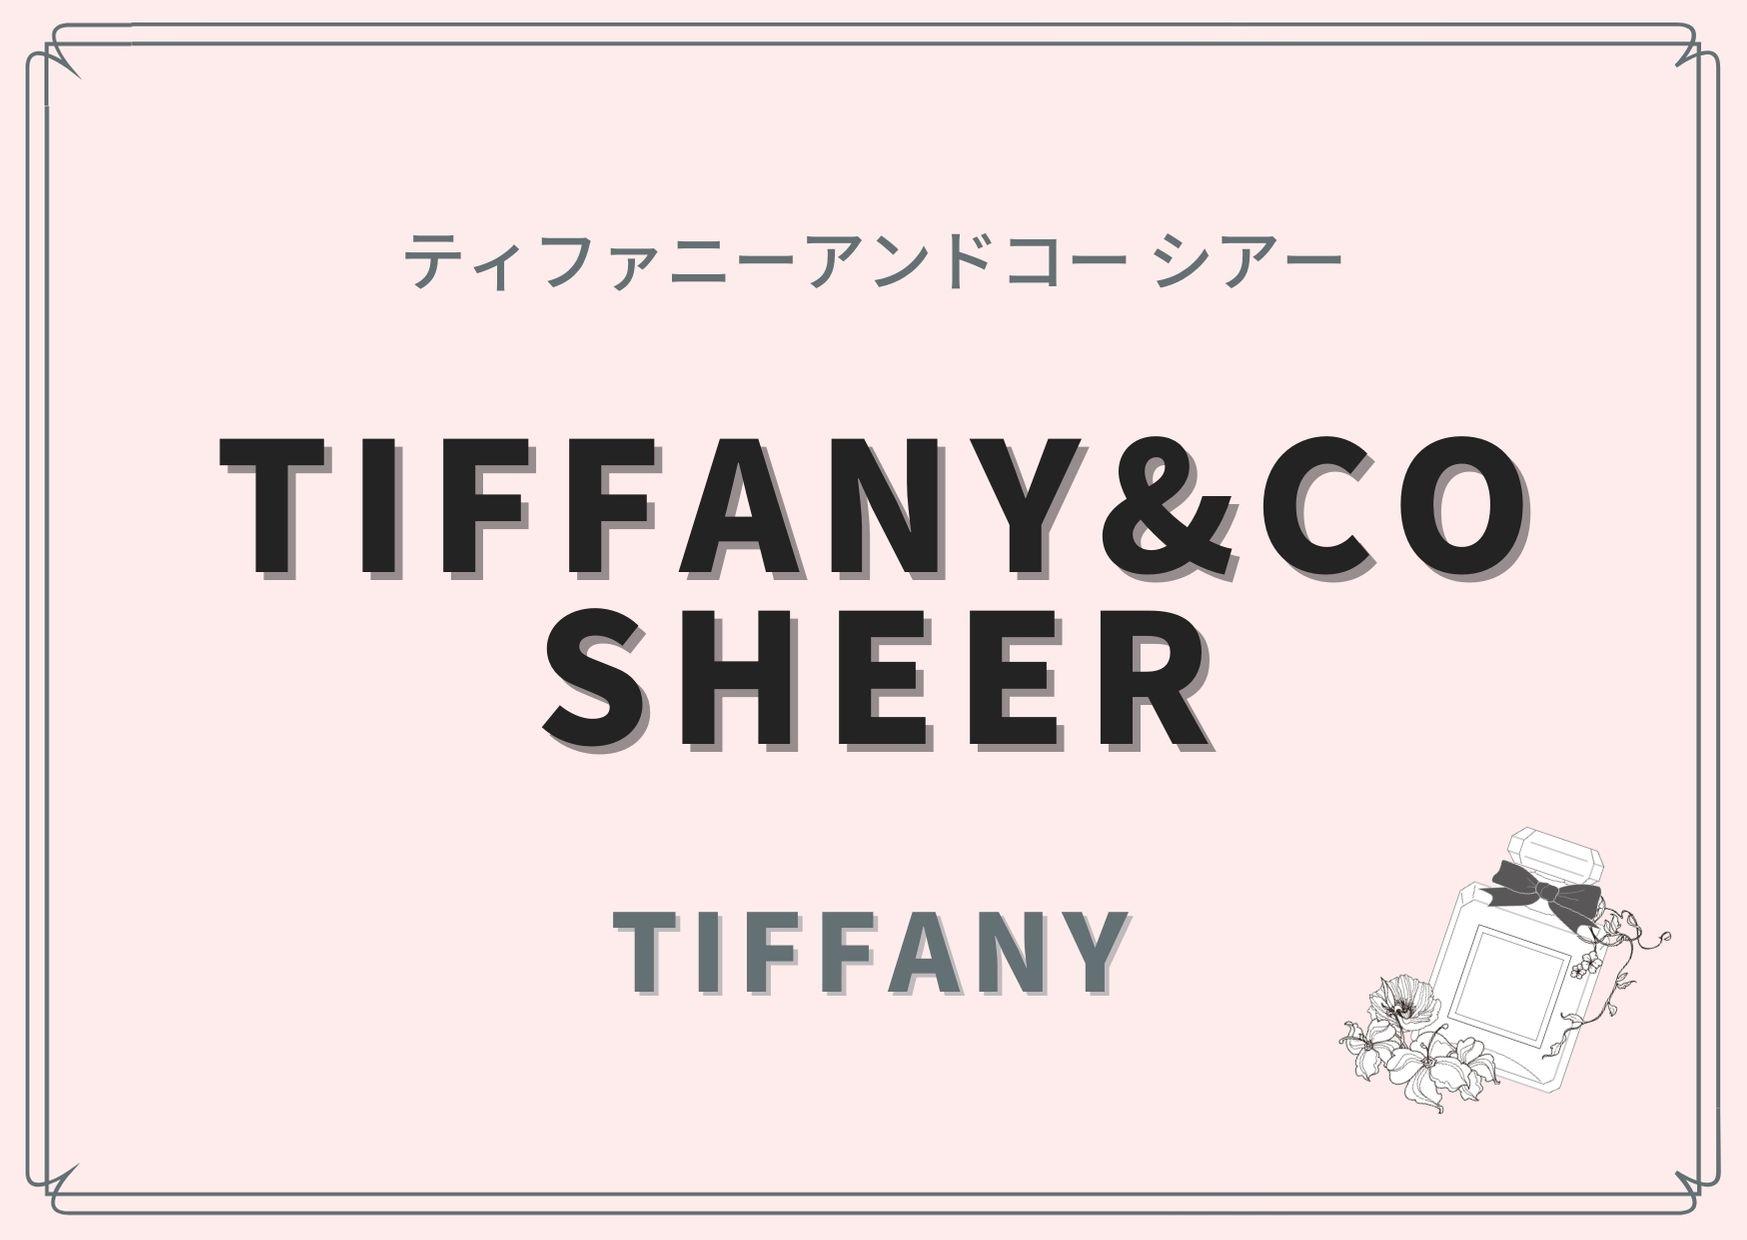 TIFFANY&Co Sheer(ティファニーアンドコー シアー)/TIFFANY(ティファニー )